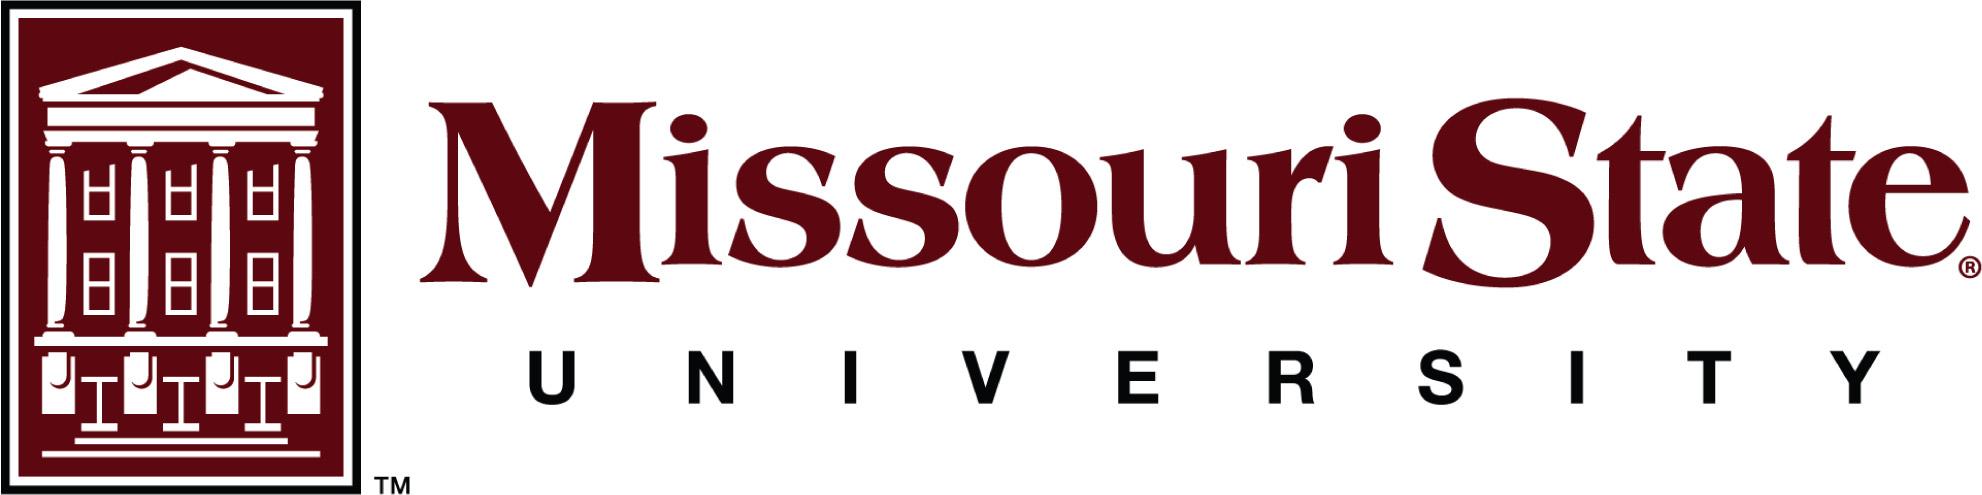 Missouri State University